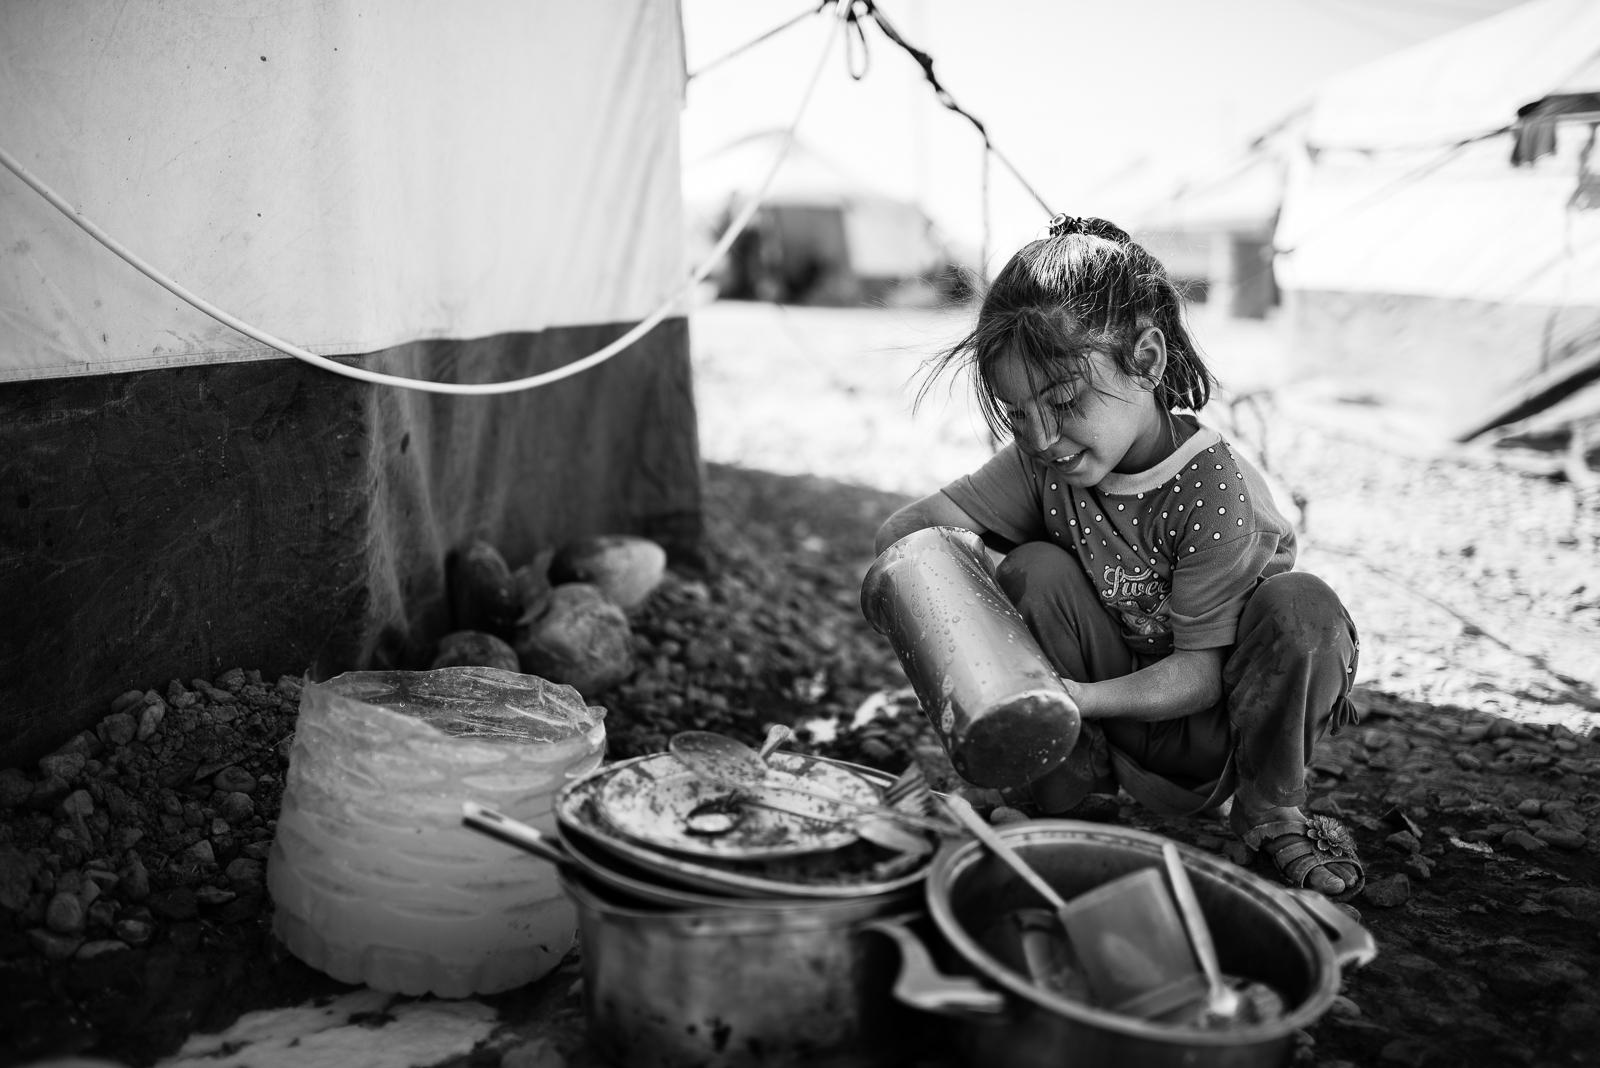 Refugees camp in Erbil